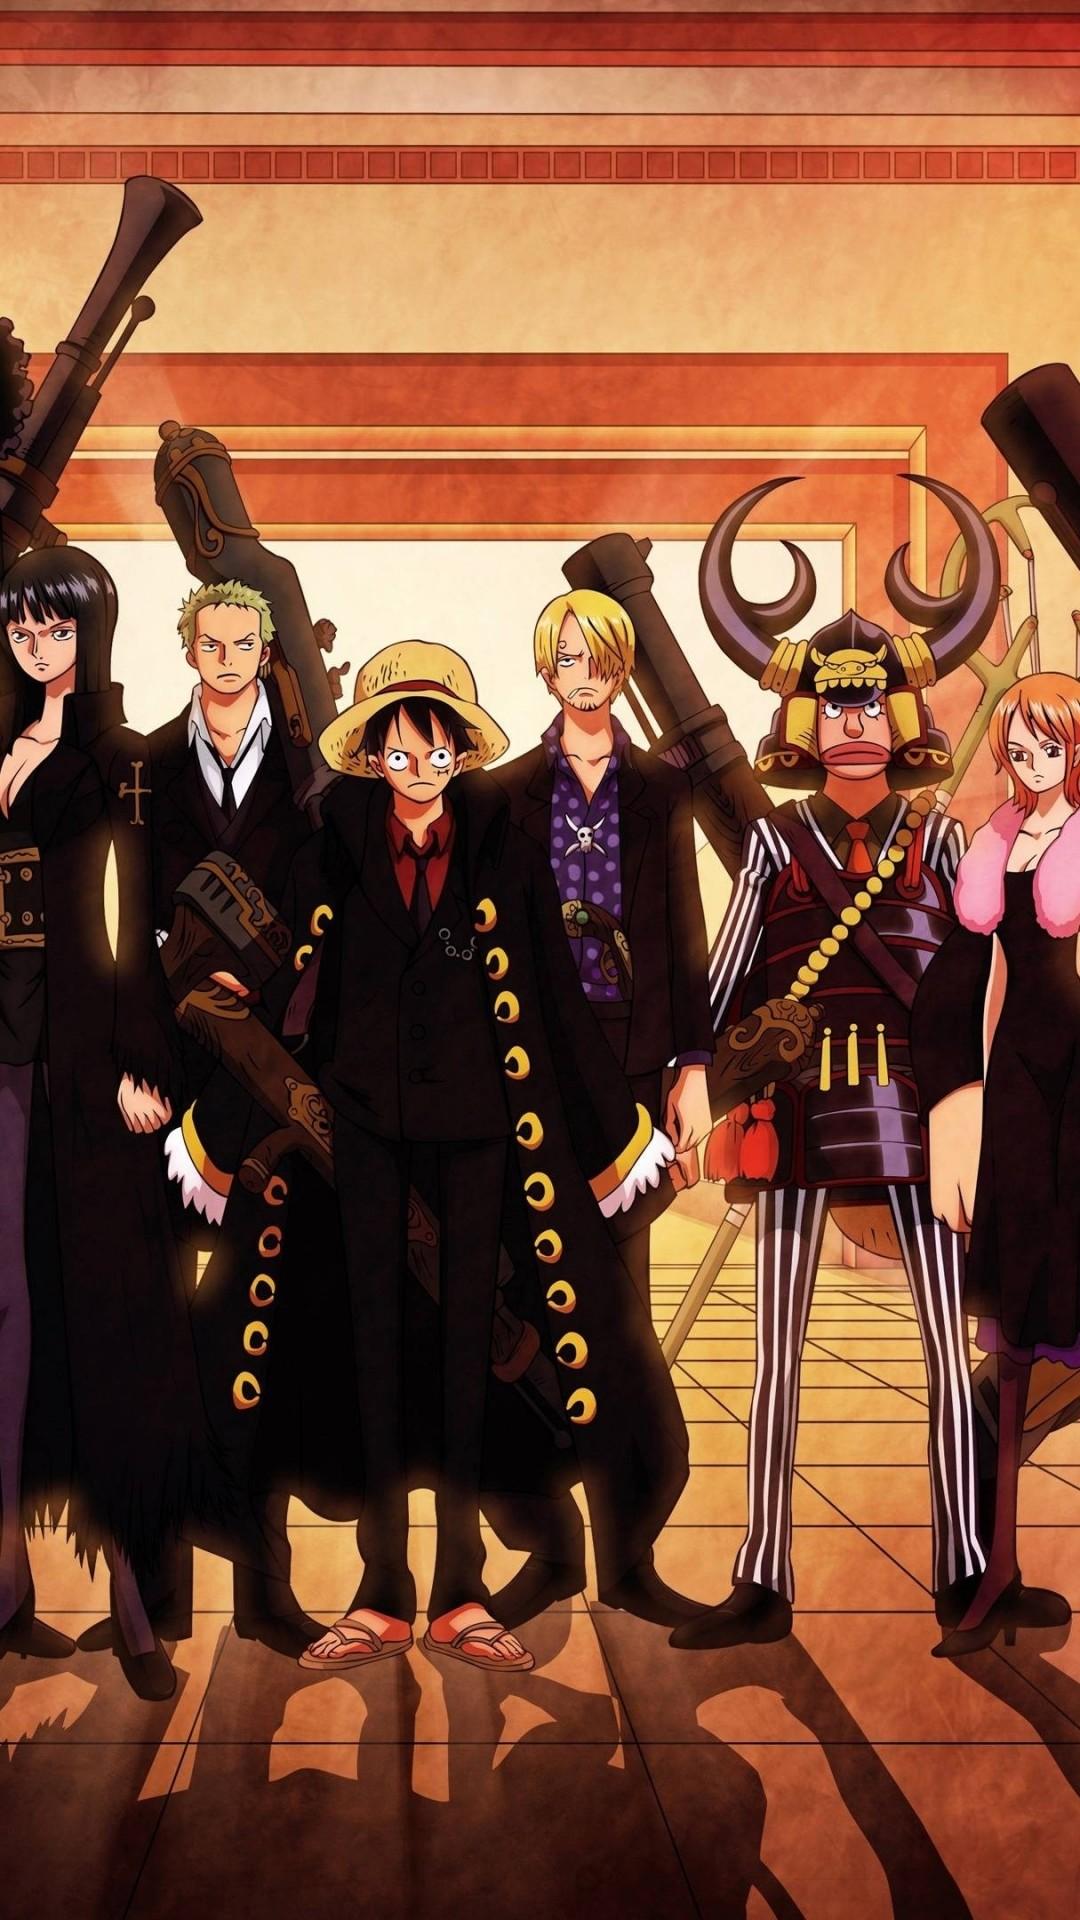 Zoro One Piece Wallpaper 1080P